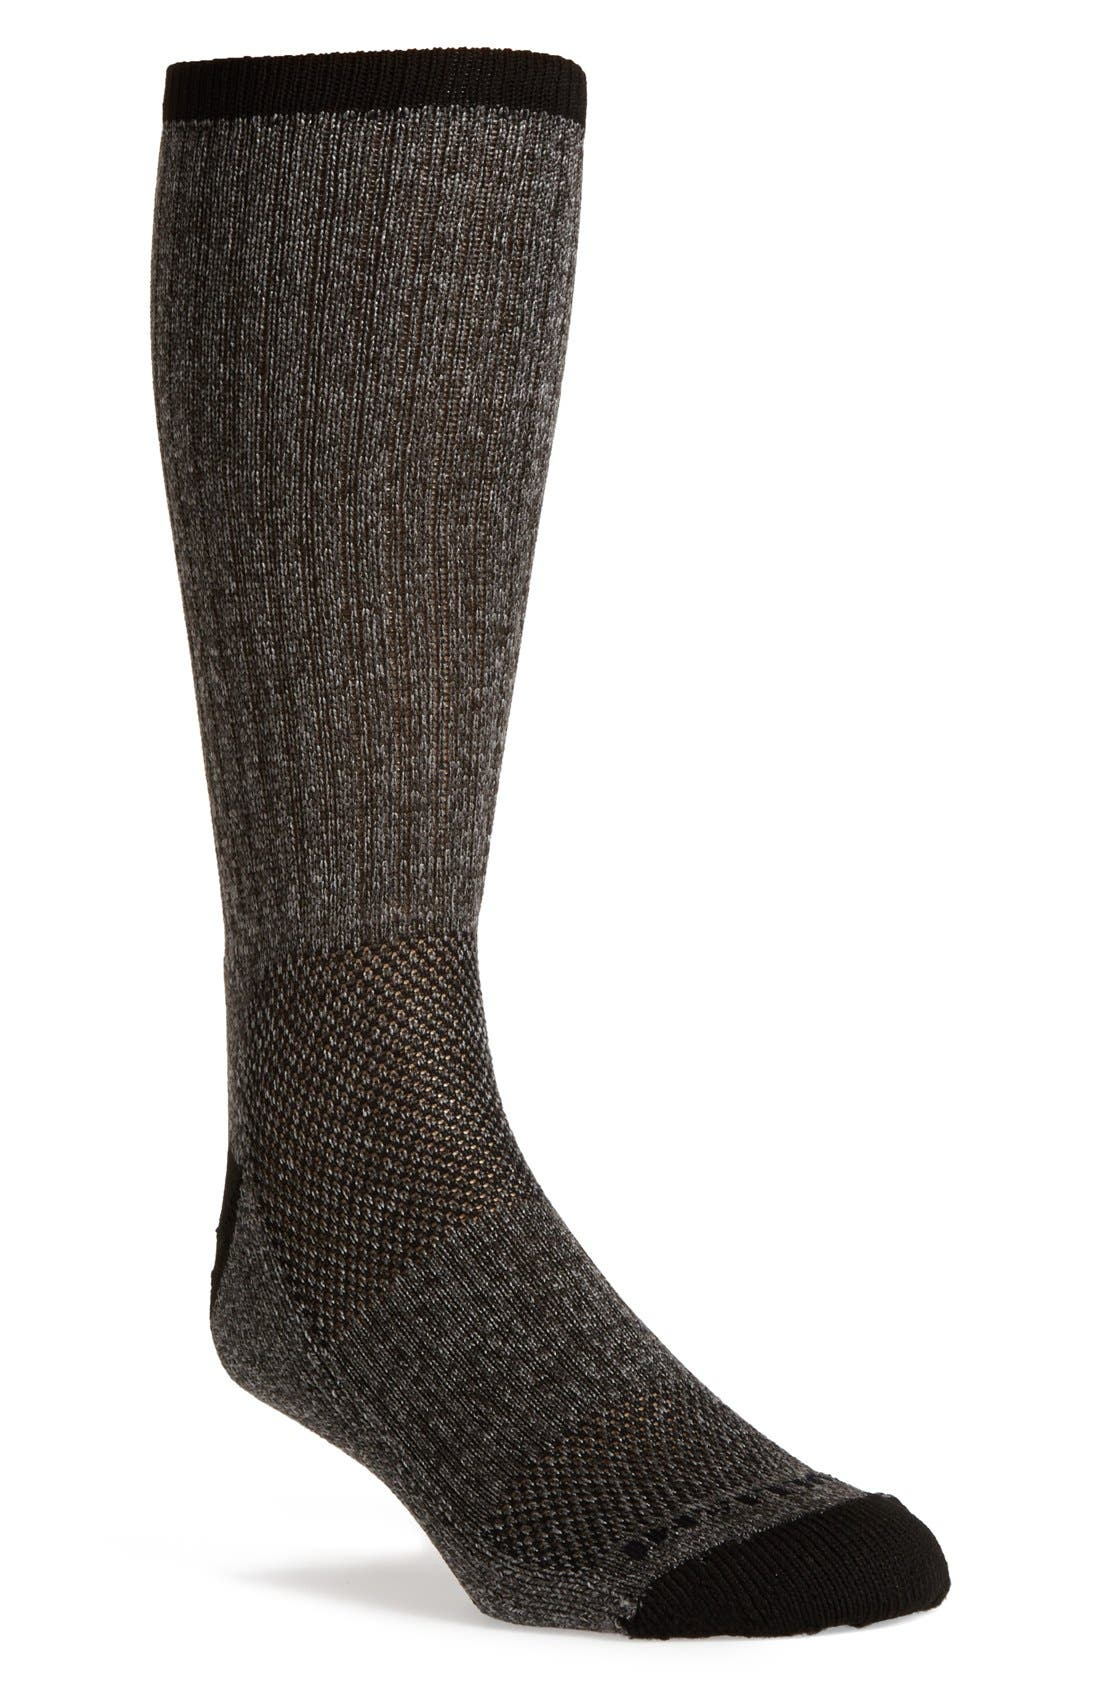 Alternate Image 1 Selected - Remo Tulliani 'Taos' Socks